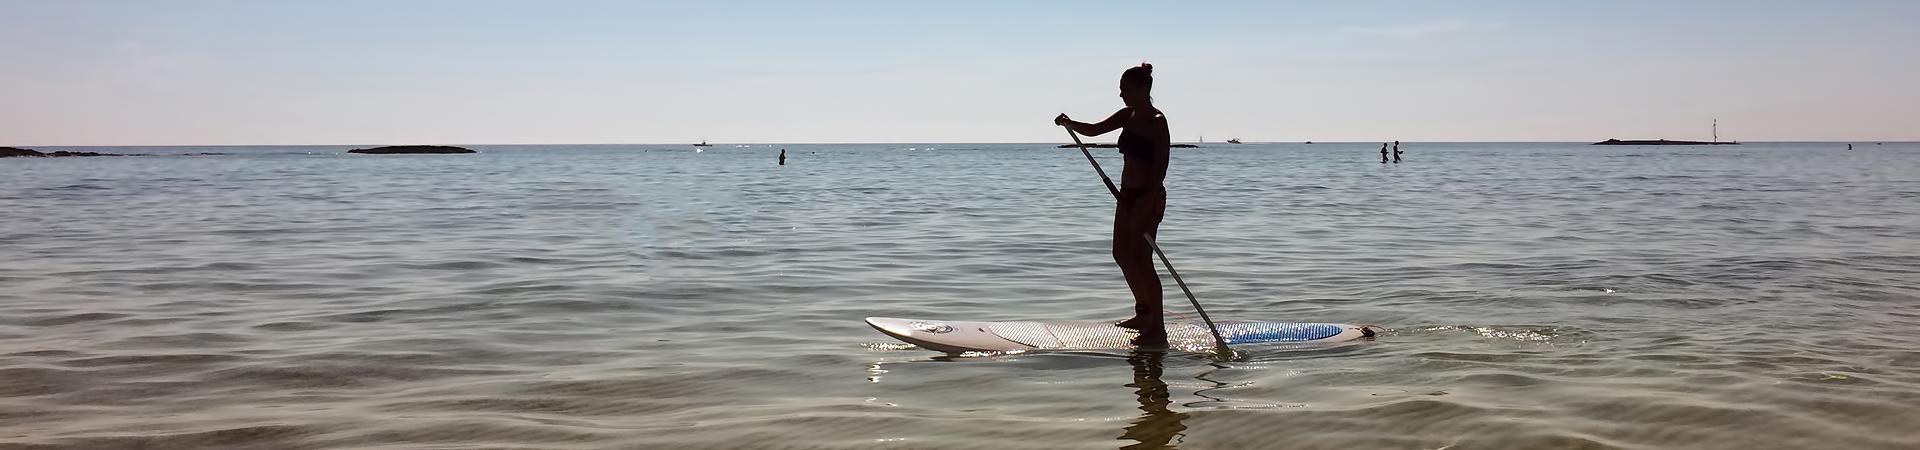 Locals_Salento_Kitesurf_paddle_Surf